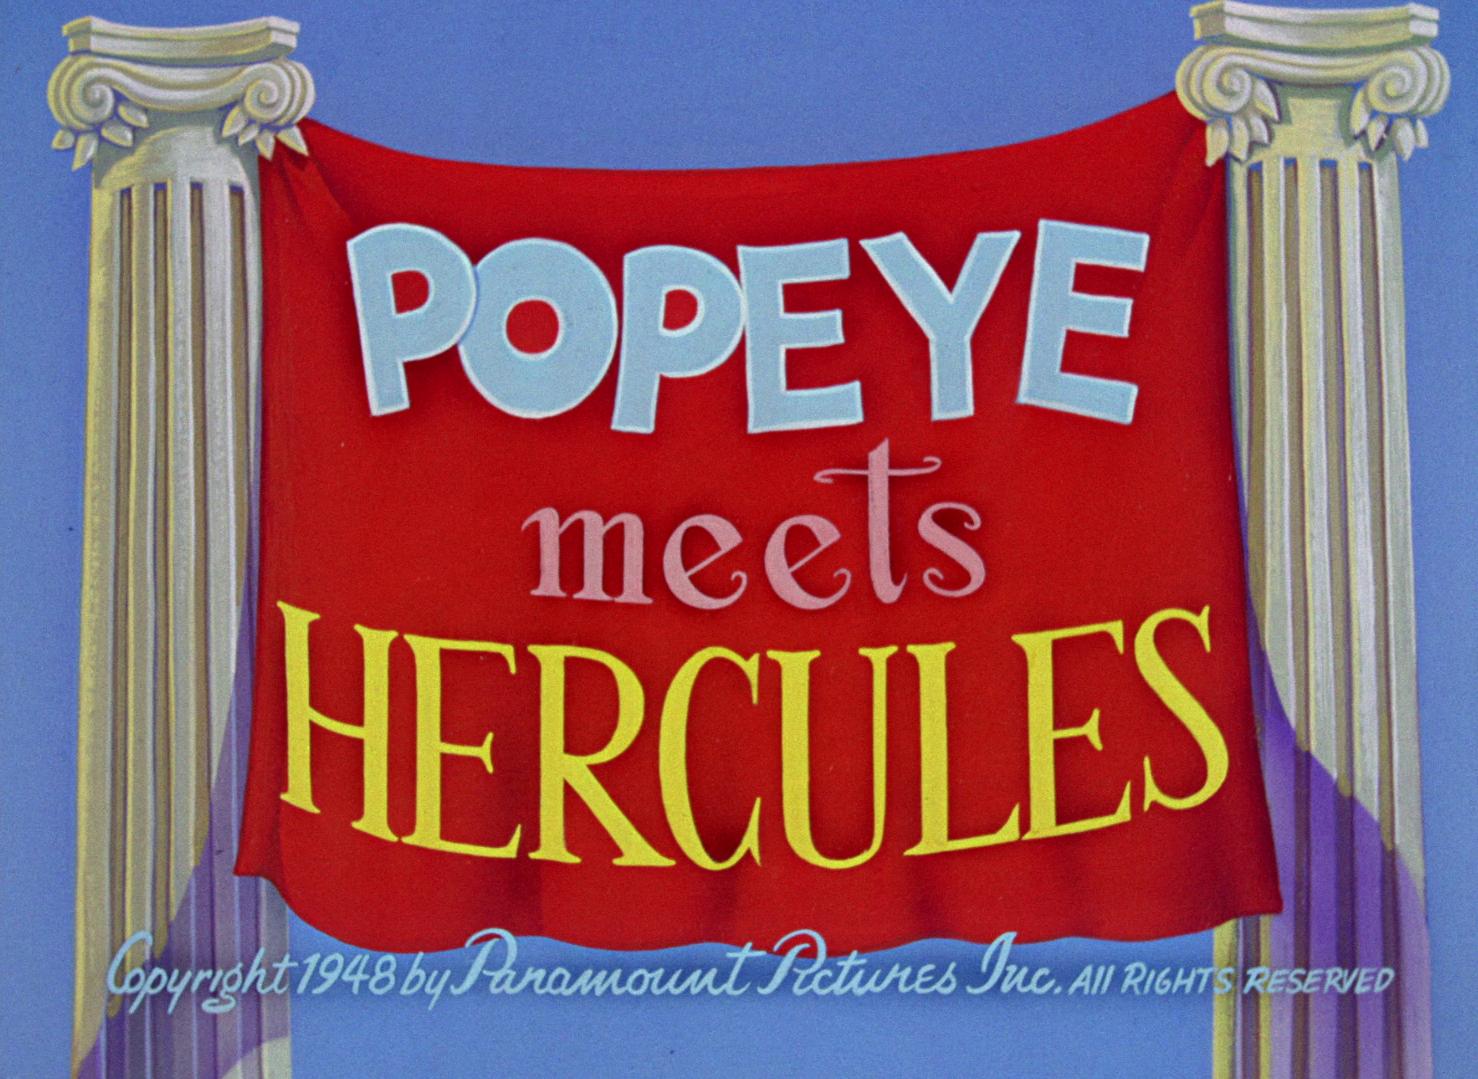 File:Popeye Meets Hercules.png